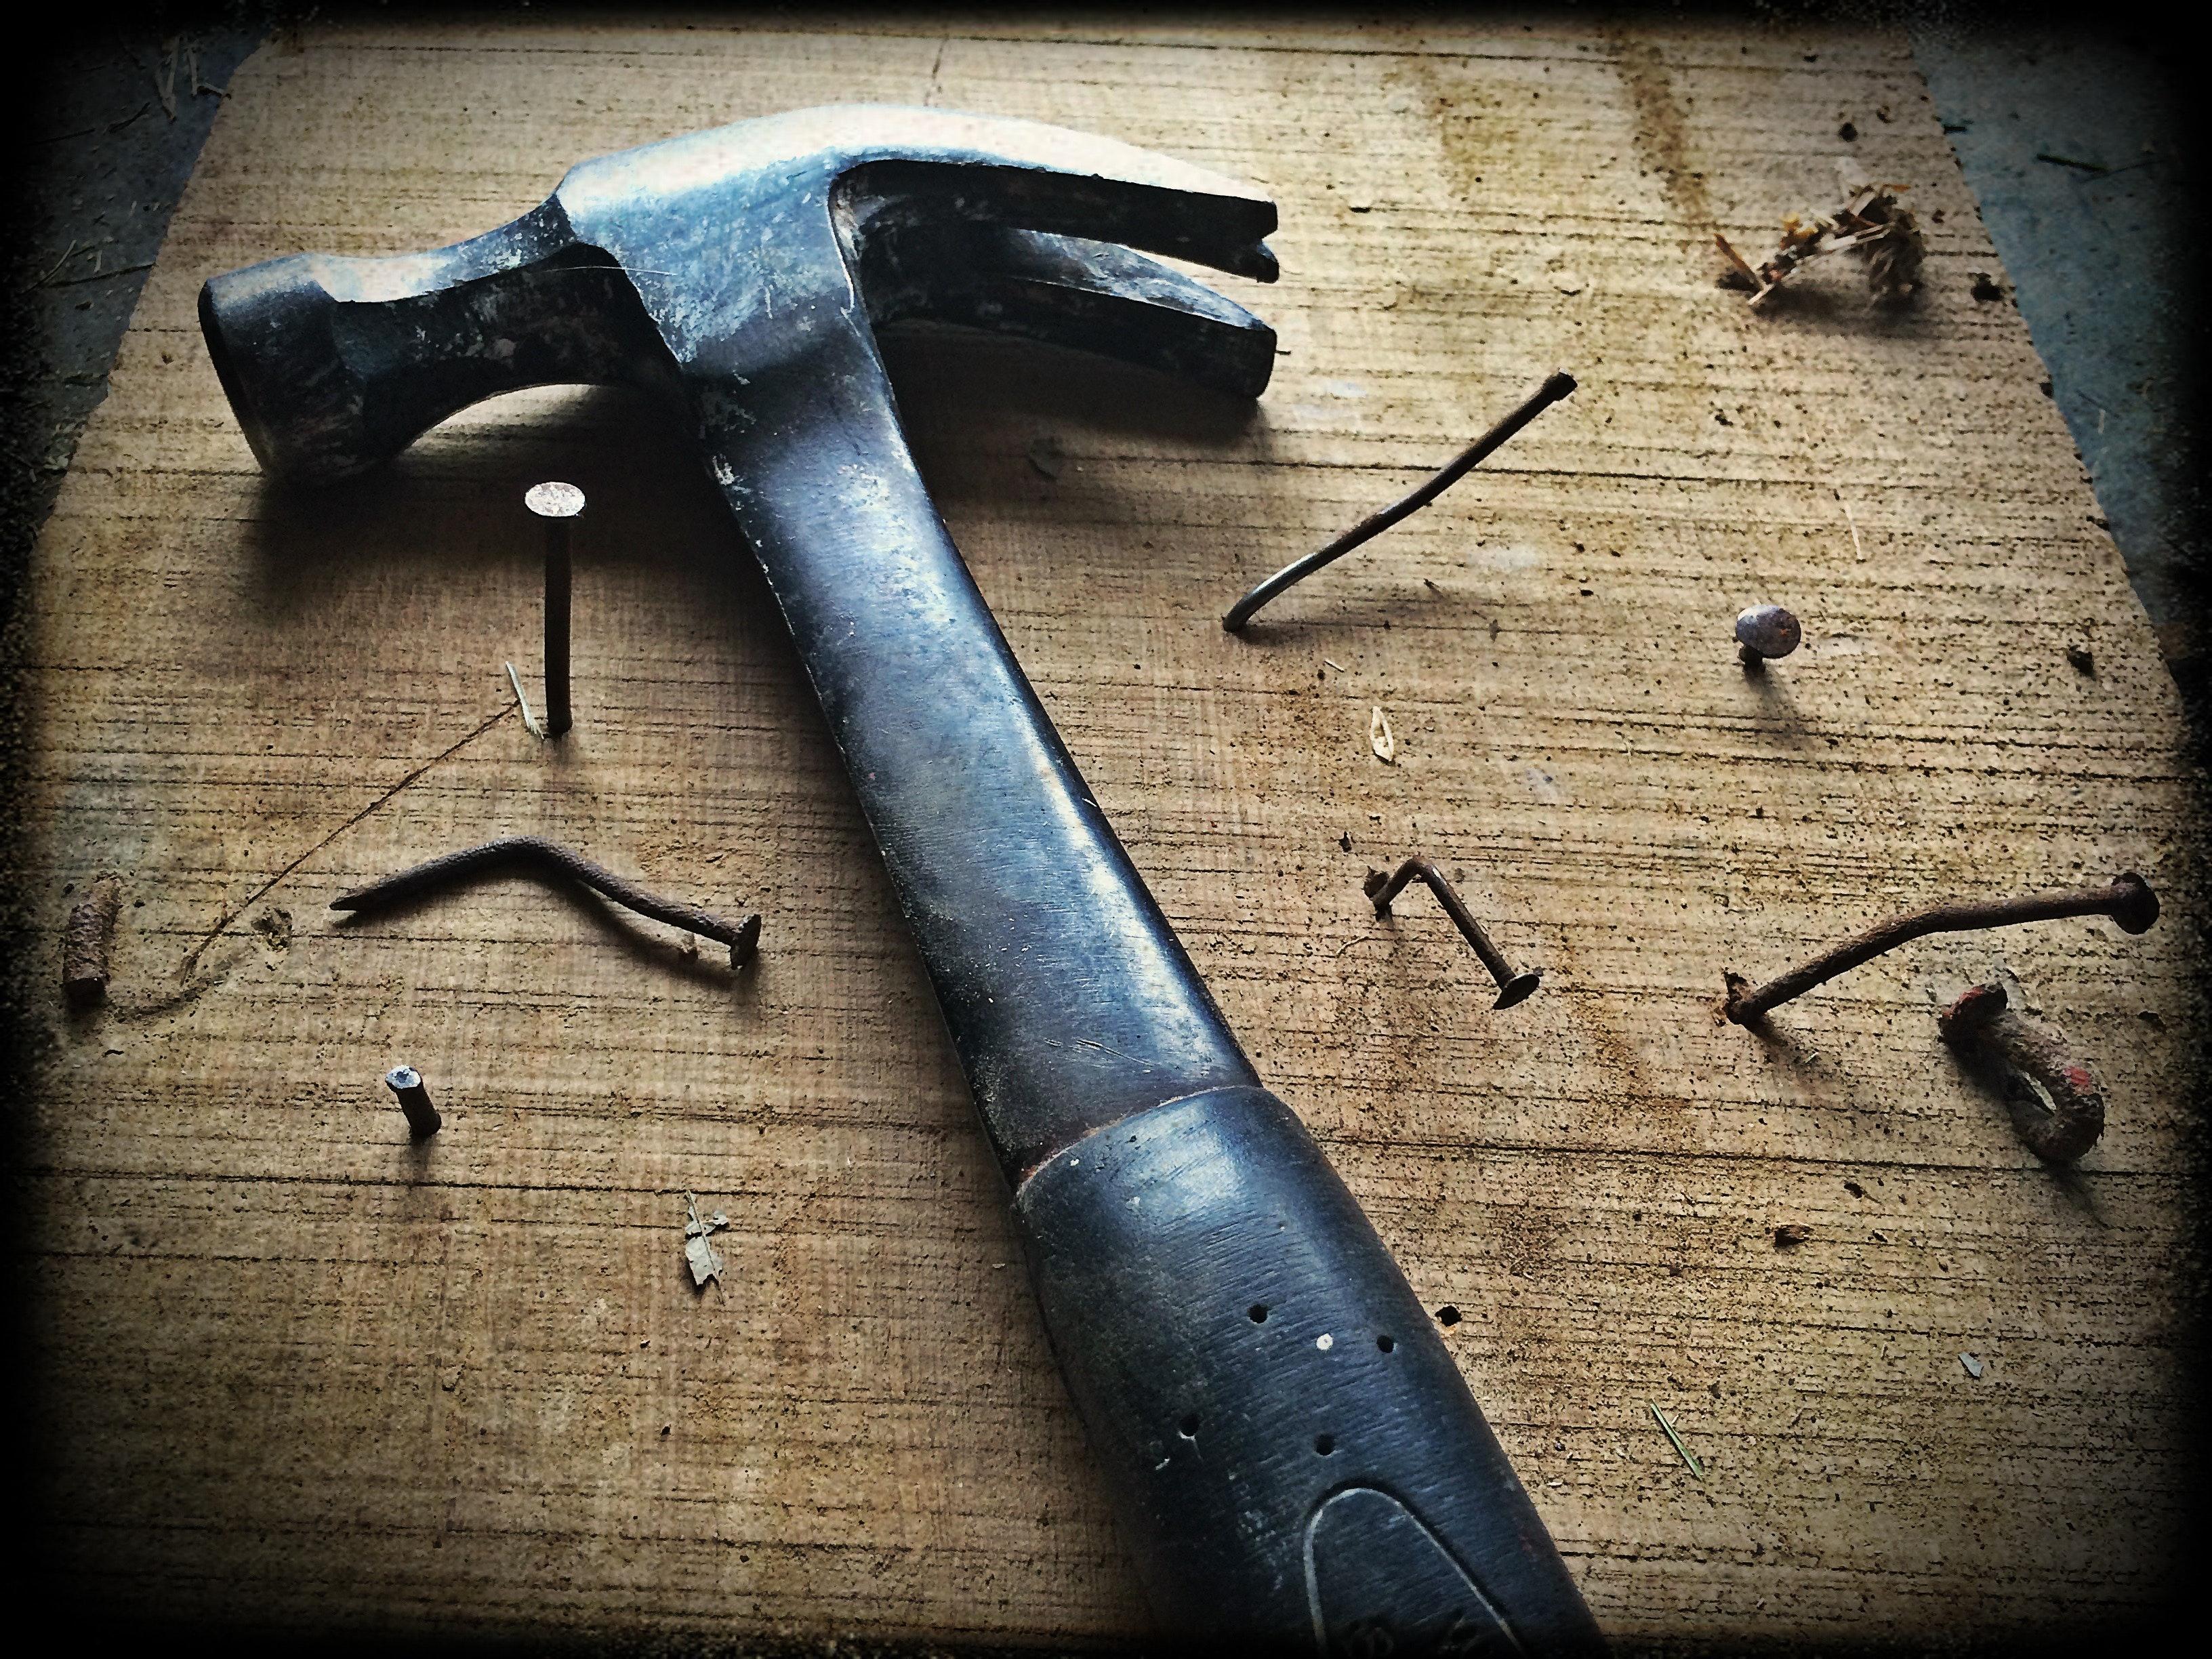 Black Claw Hammer on Brown Wooden Plank, Board, Retro, Work, Woodwork, HQ Photo